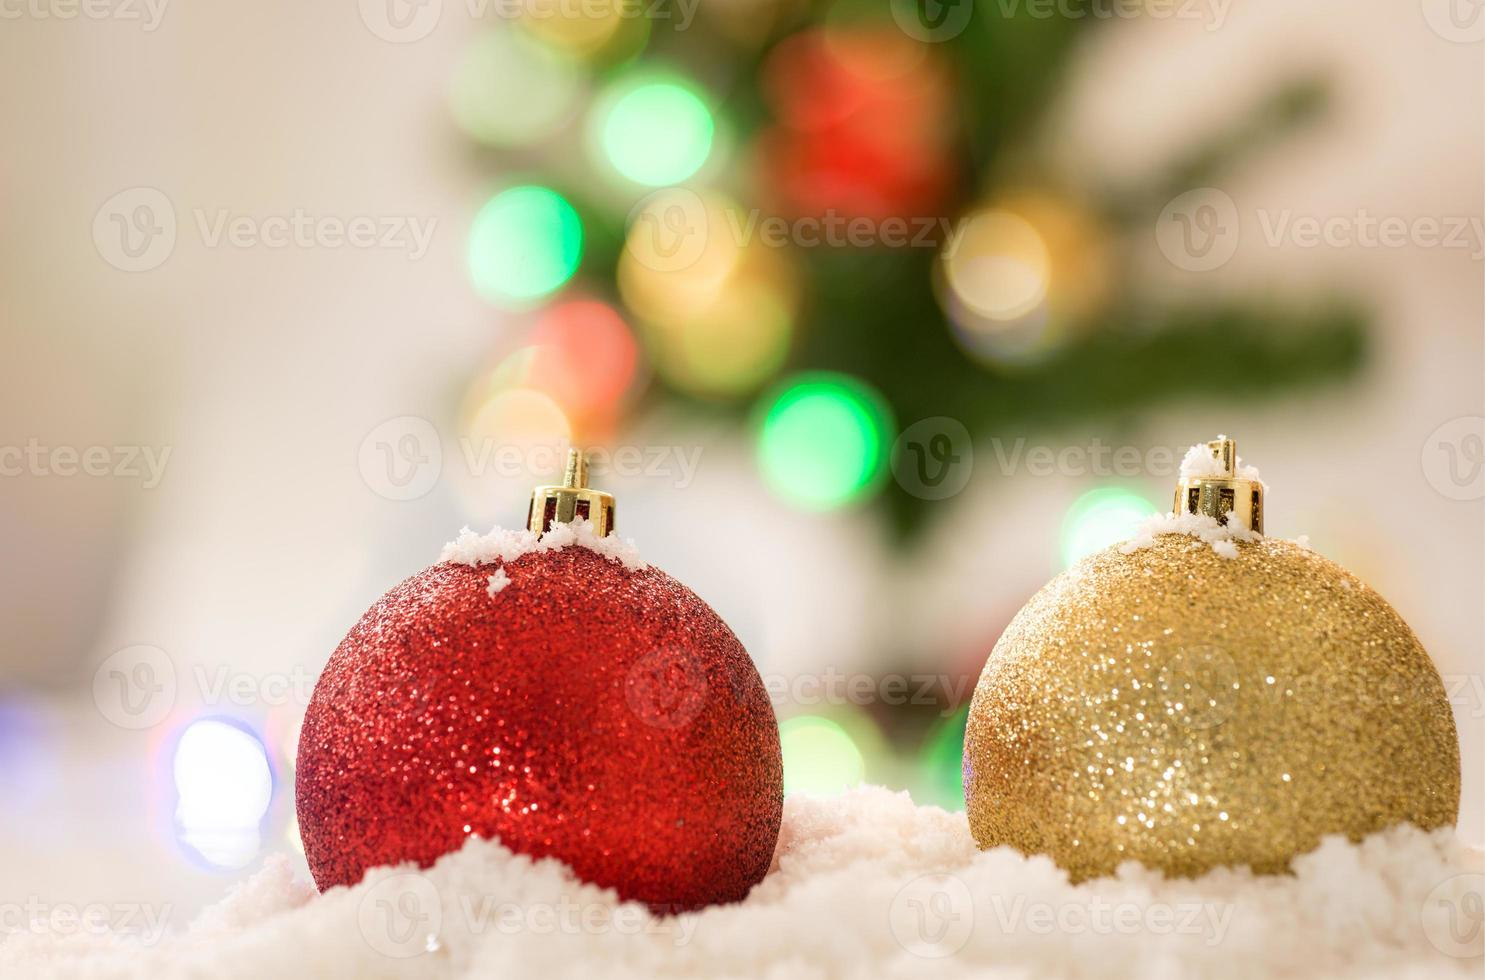 red and gold chrismas ball on snow with chrismas photo